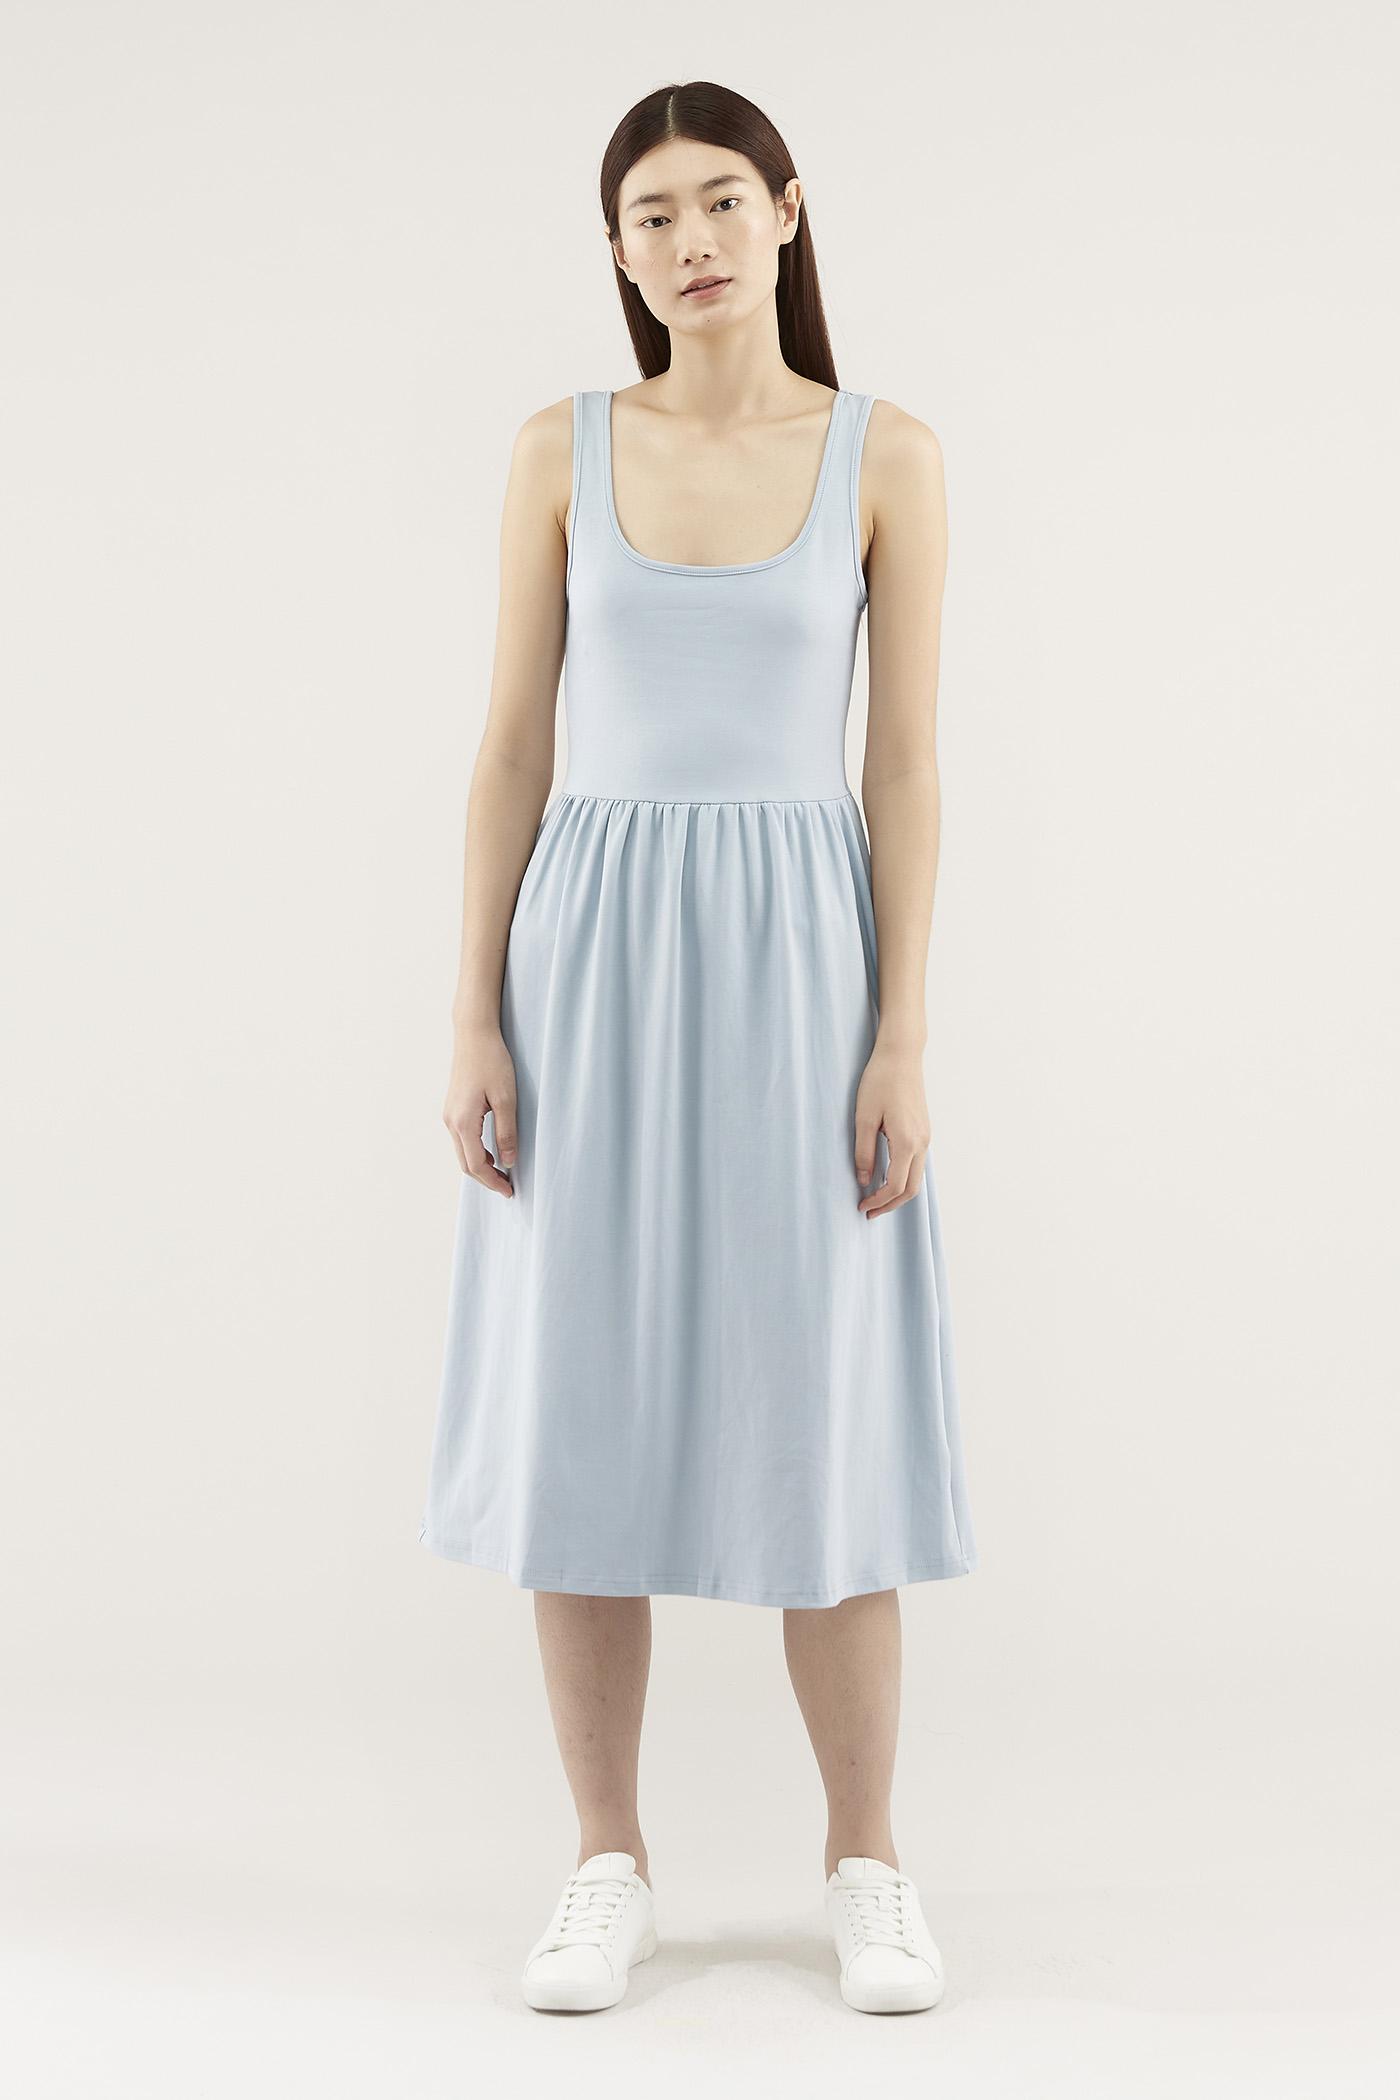 Haleen Swing Dress